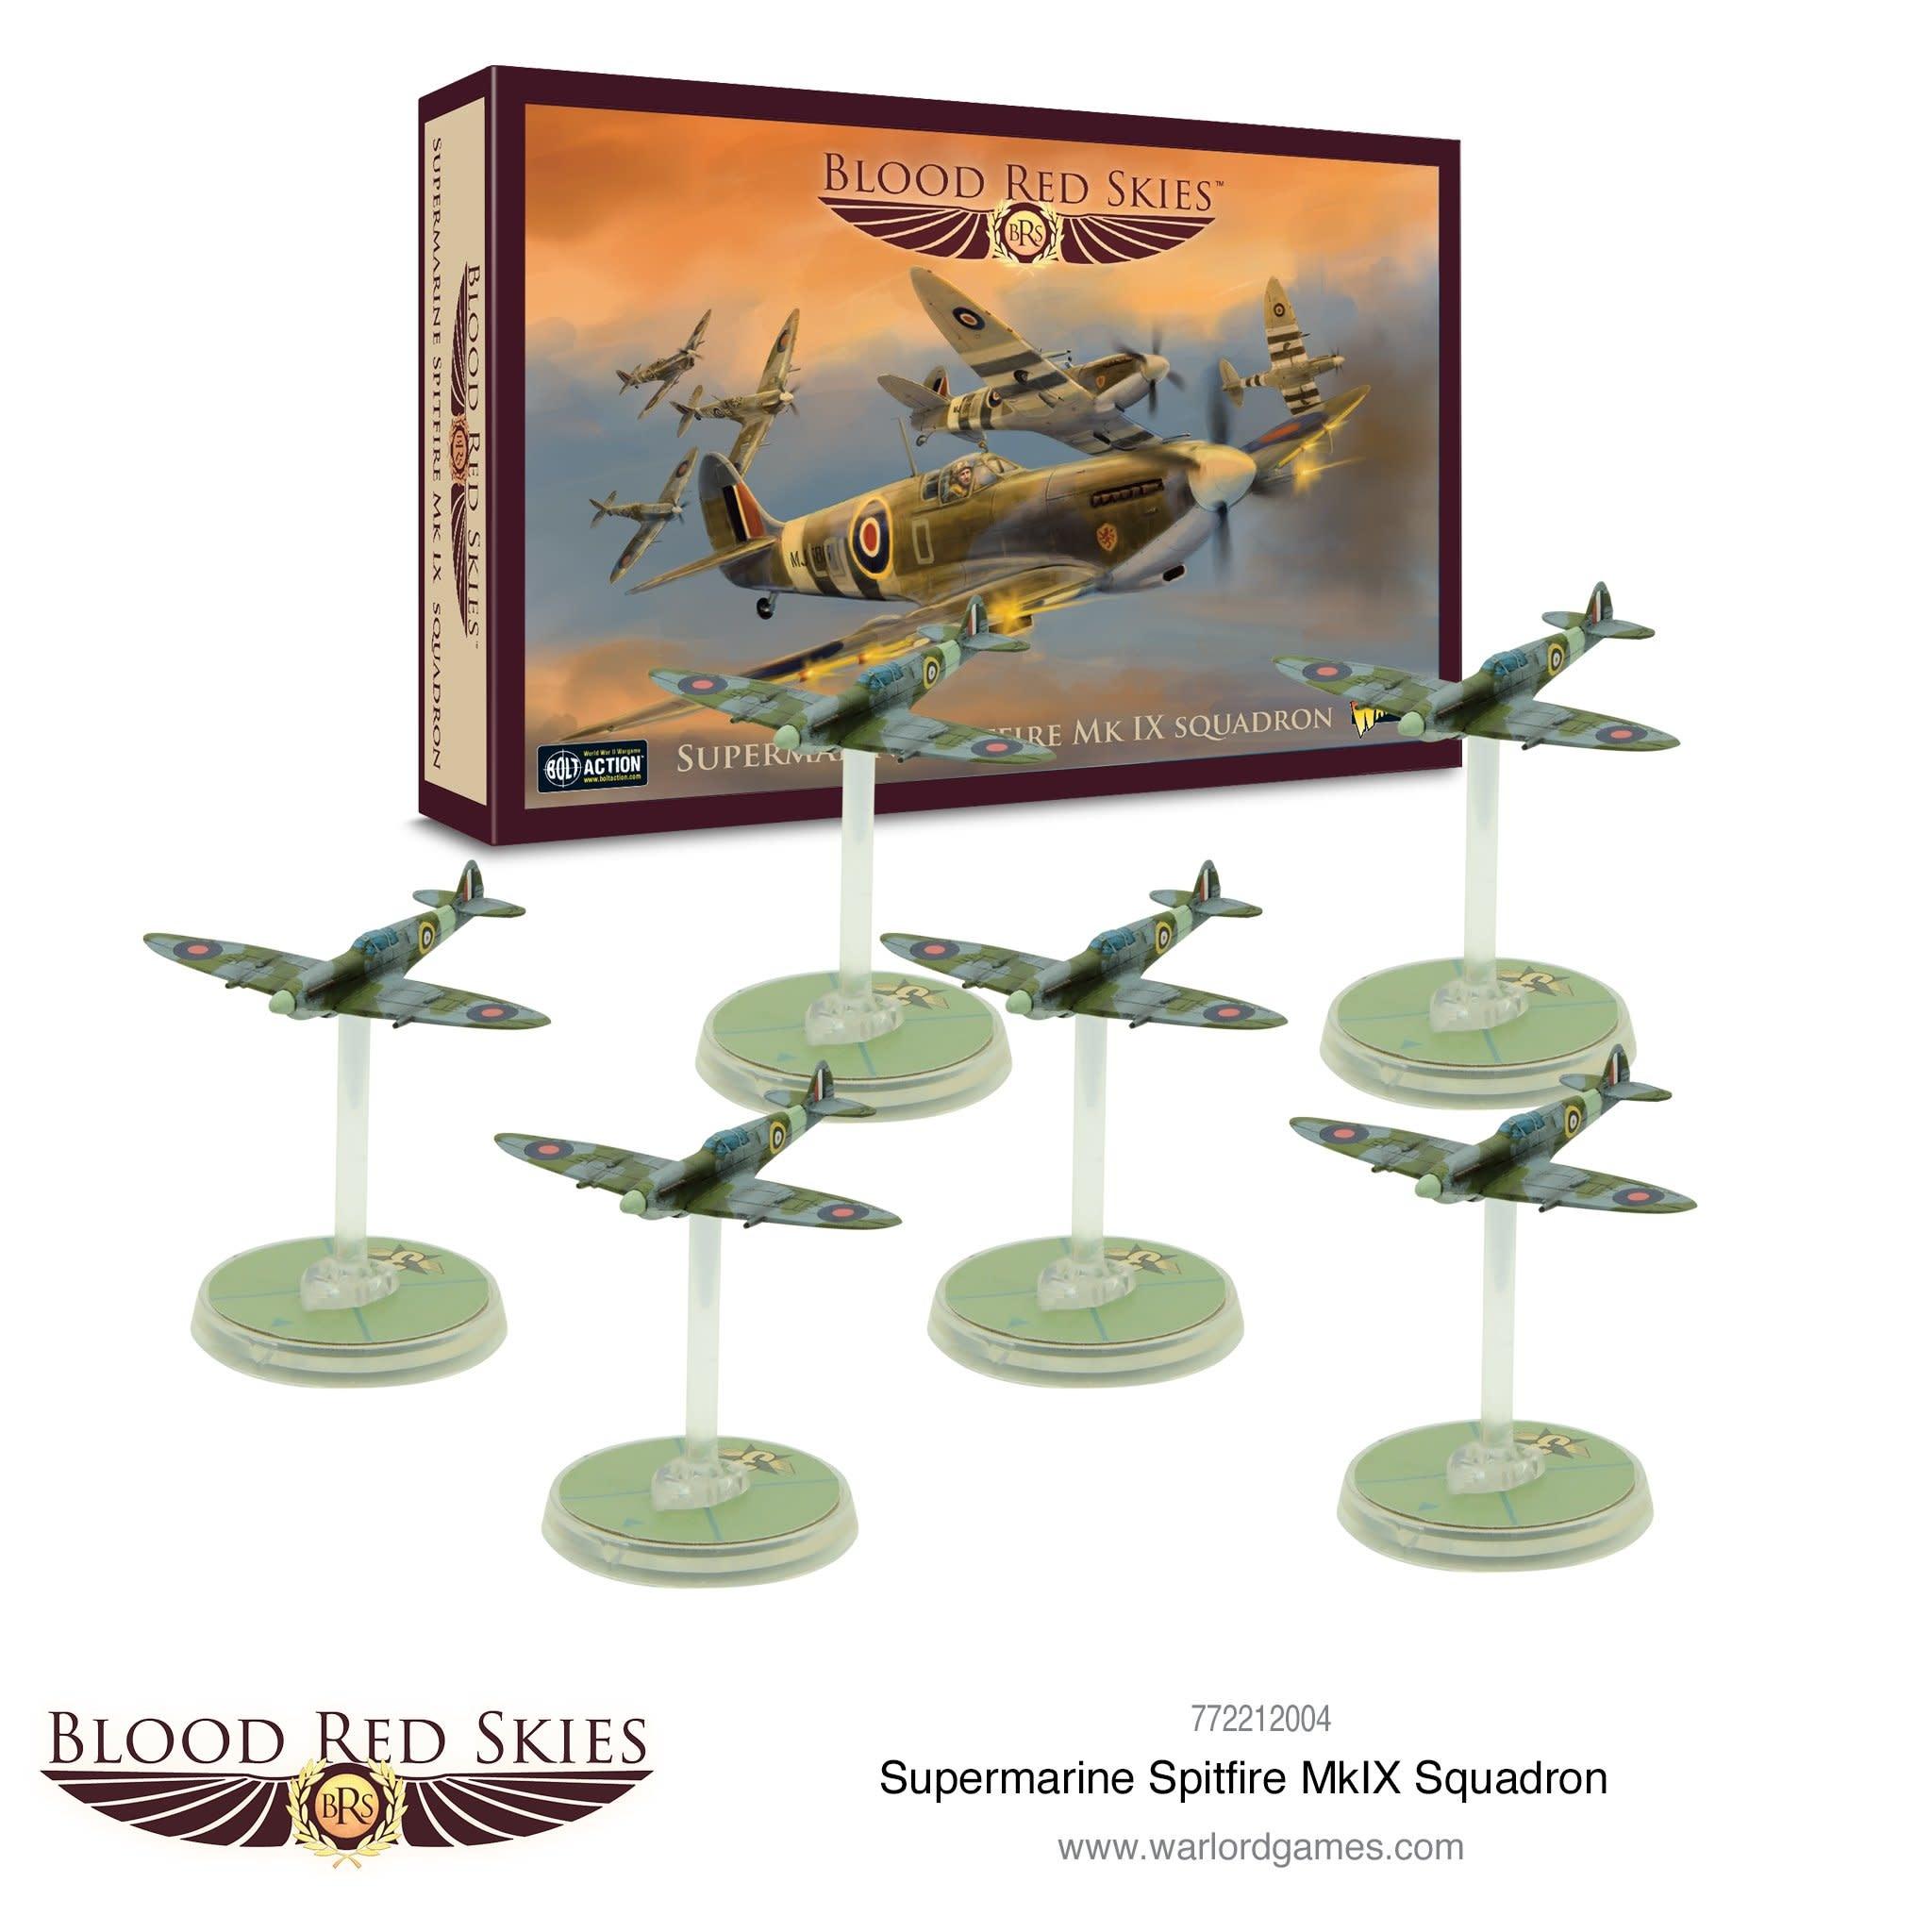 Warlord games Blood Red Skies: British, Supermarine Spitfire Mk. II